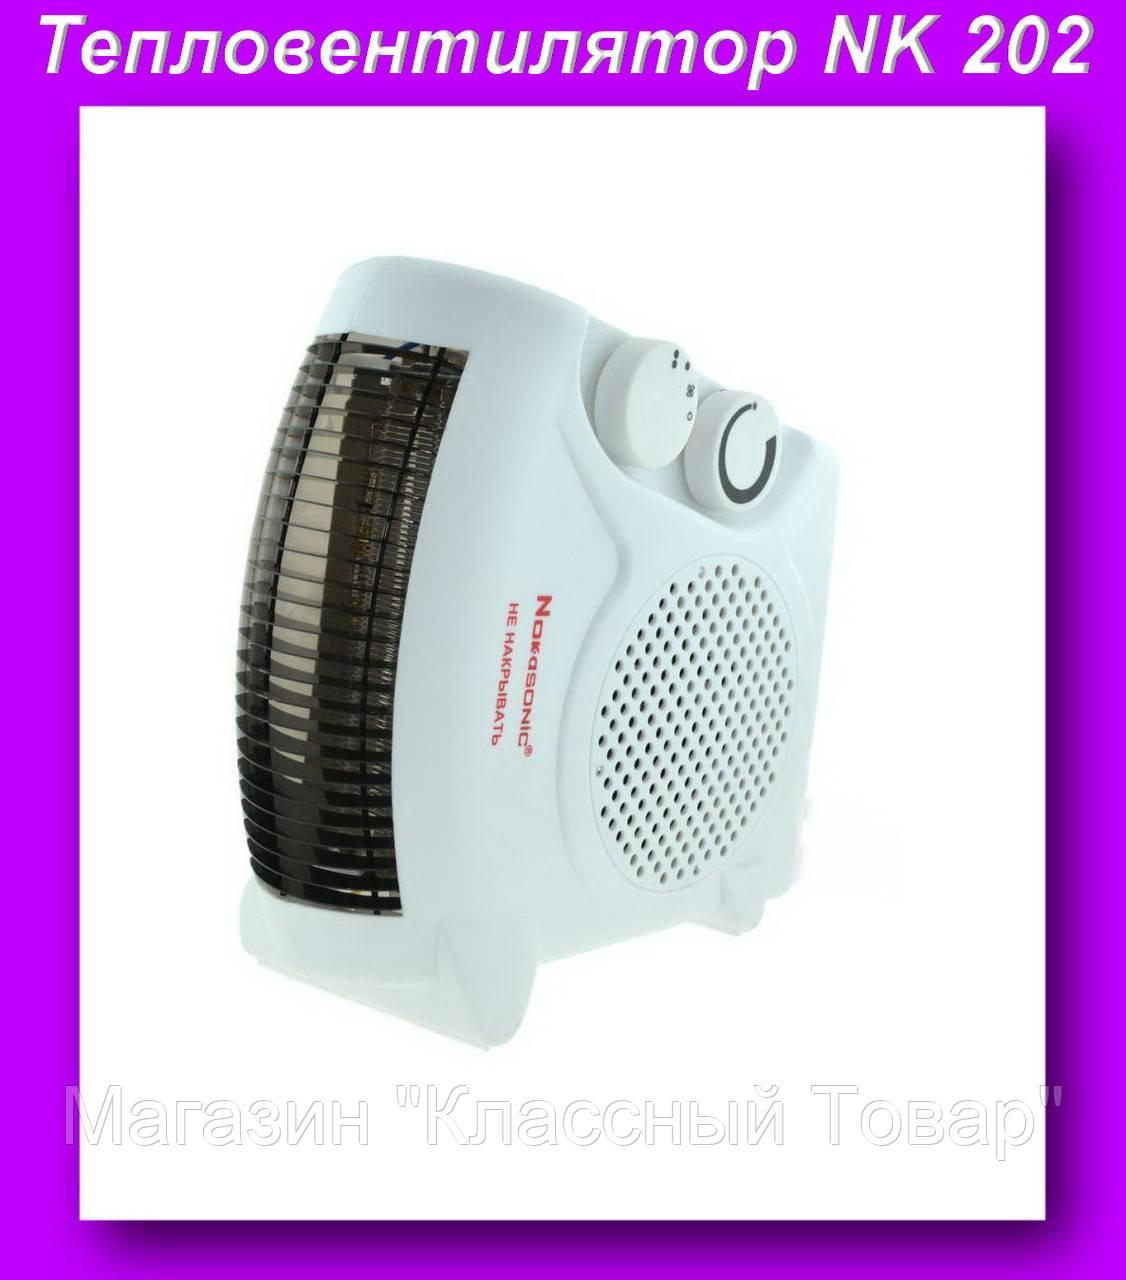 Тепловентилятор FAN HEATER NK 202,Тепловентилятор напольный,Тепловентилятор электрический!Лучший подарок